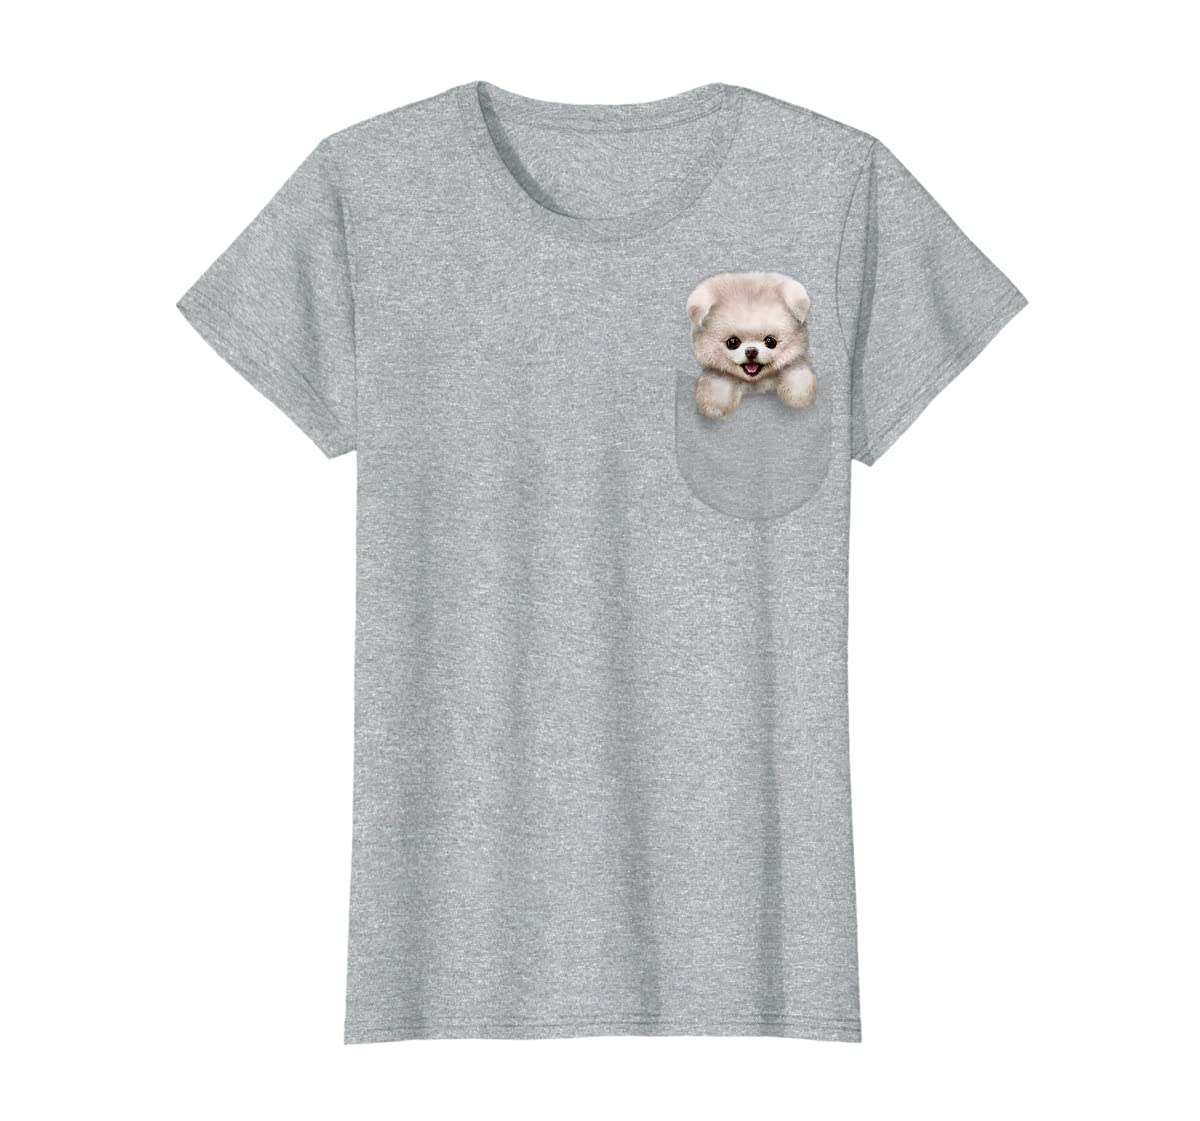 T-Shirt, Cute White Fluffy Pomeranian Puppy in Pocket, Dog-Women's T-Shirt-Sport Grey